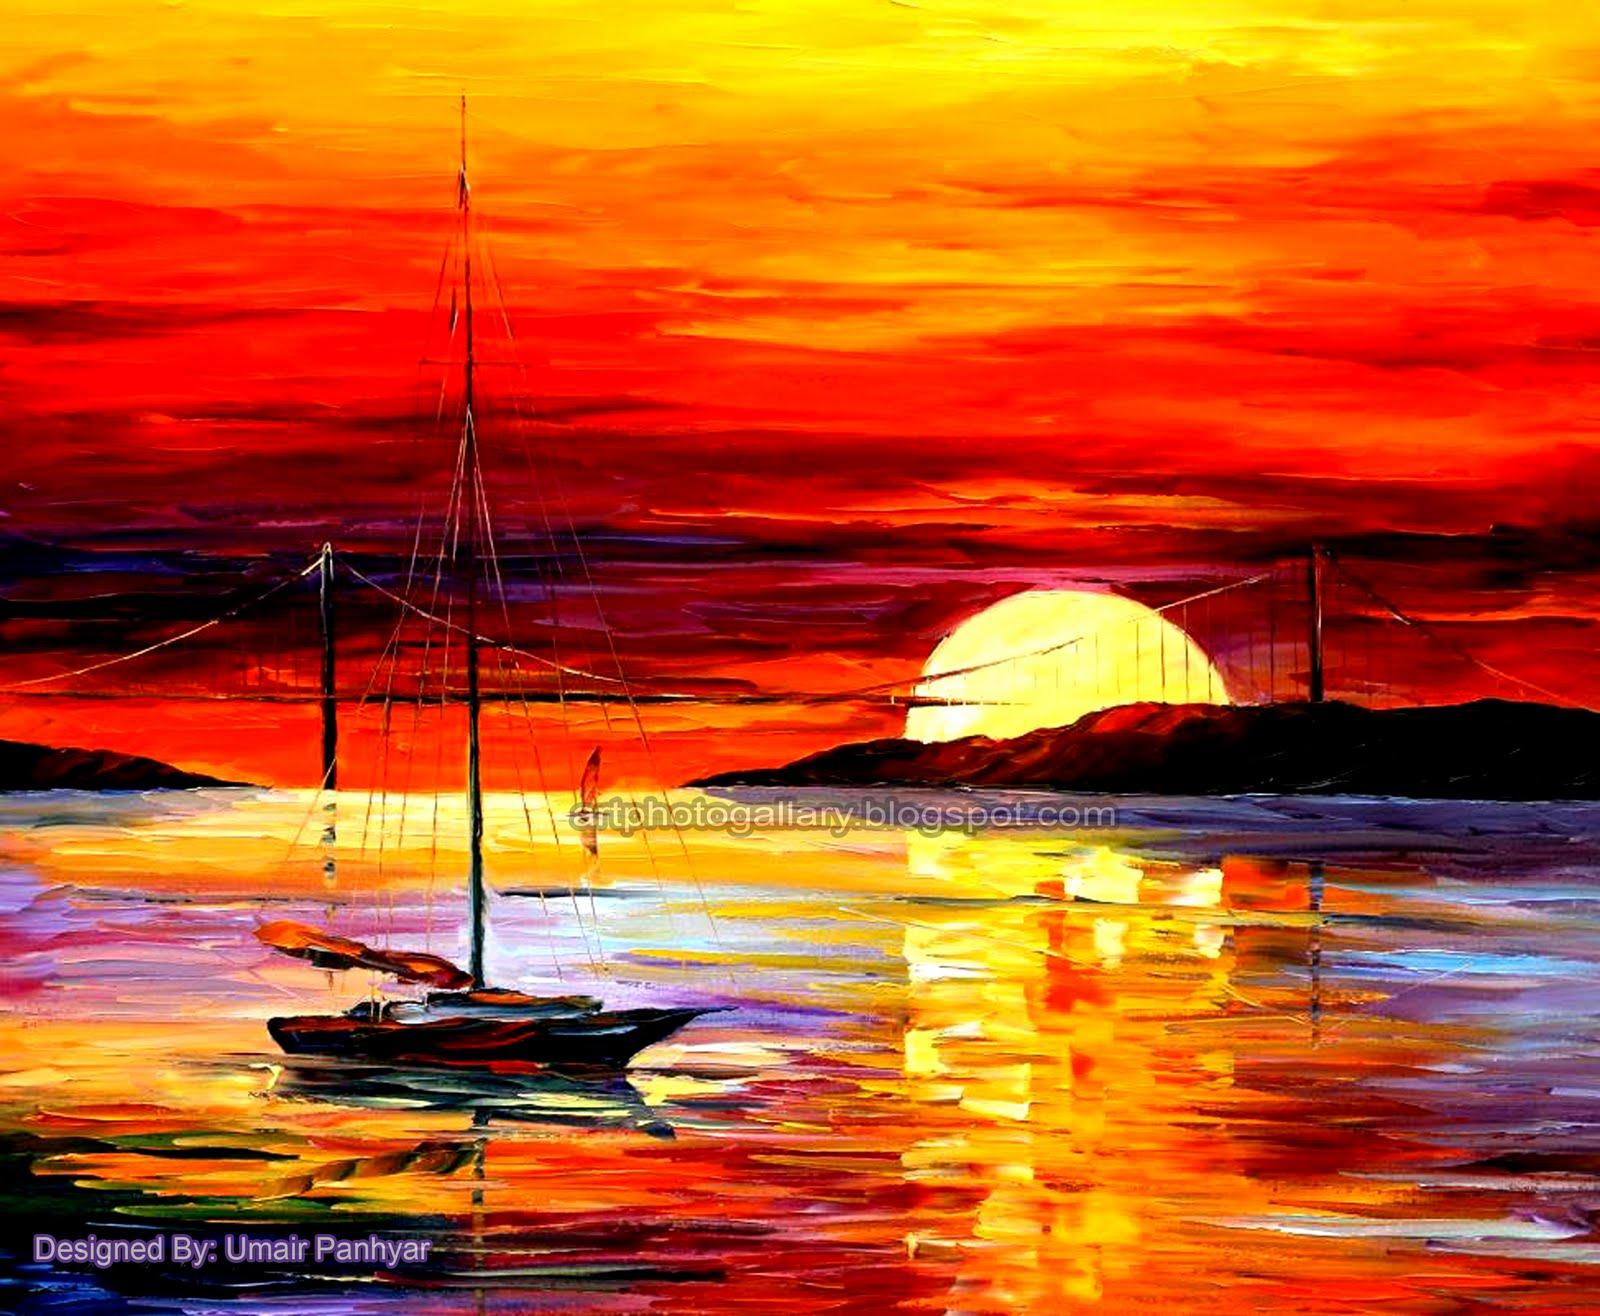 Sunset Painting - Art Photo Gallery